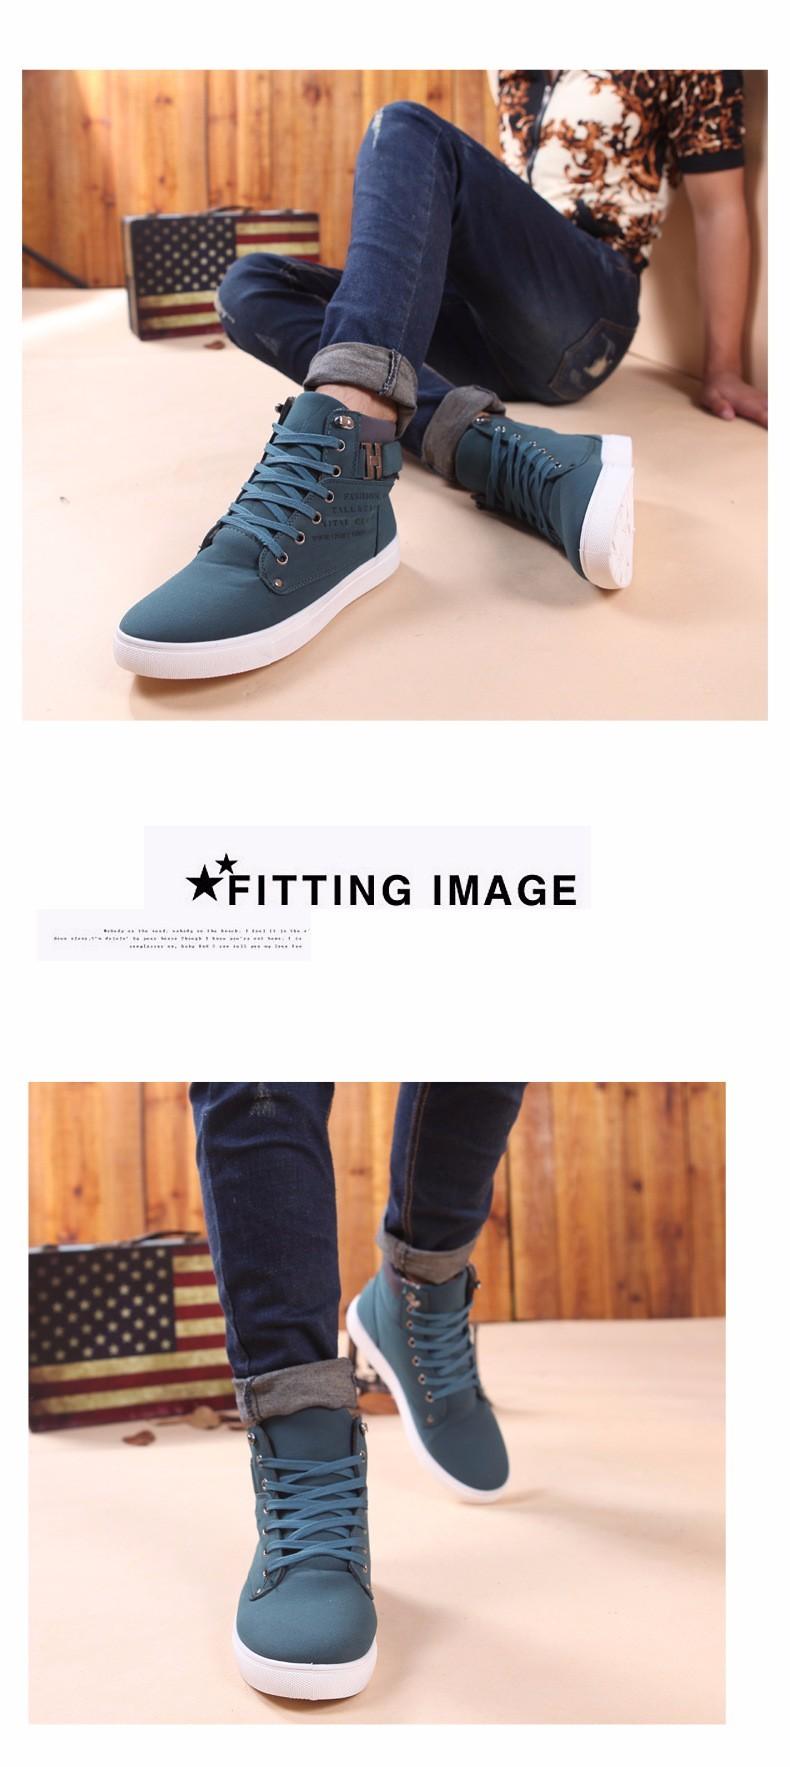 New fashion 2016 men shoes winter high top lace up casual ankle autumn flock men shoes British style casual shoes ET09 (9)